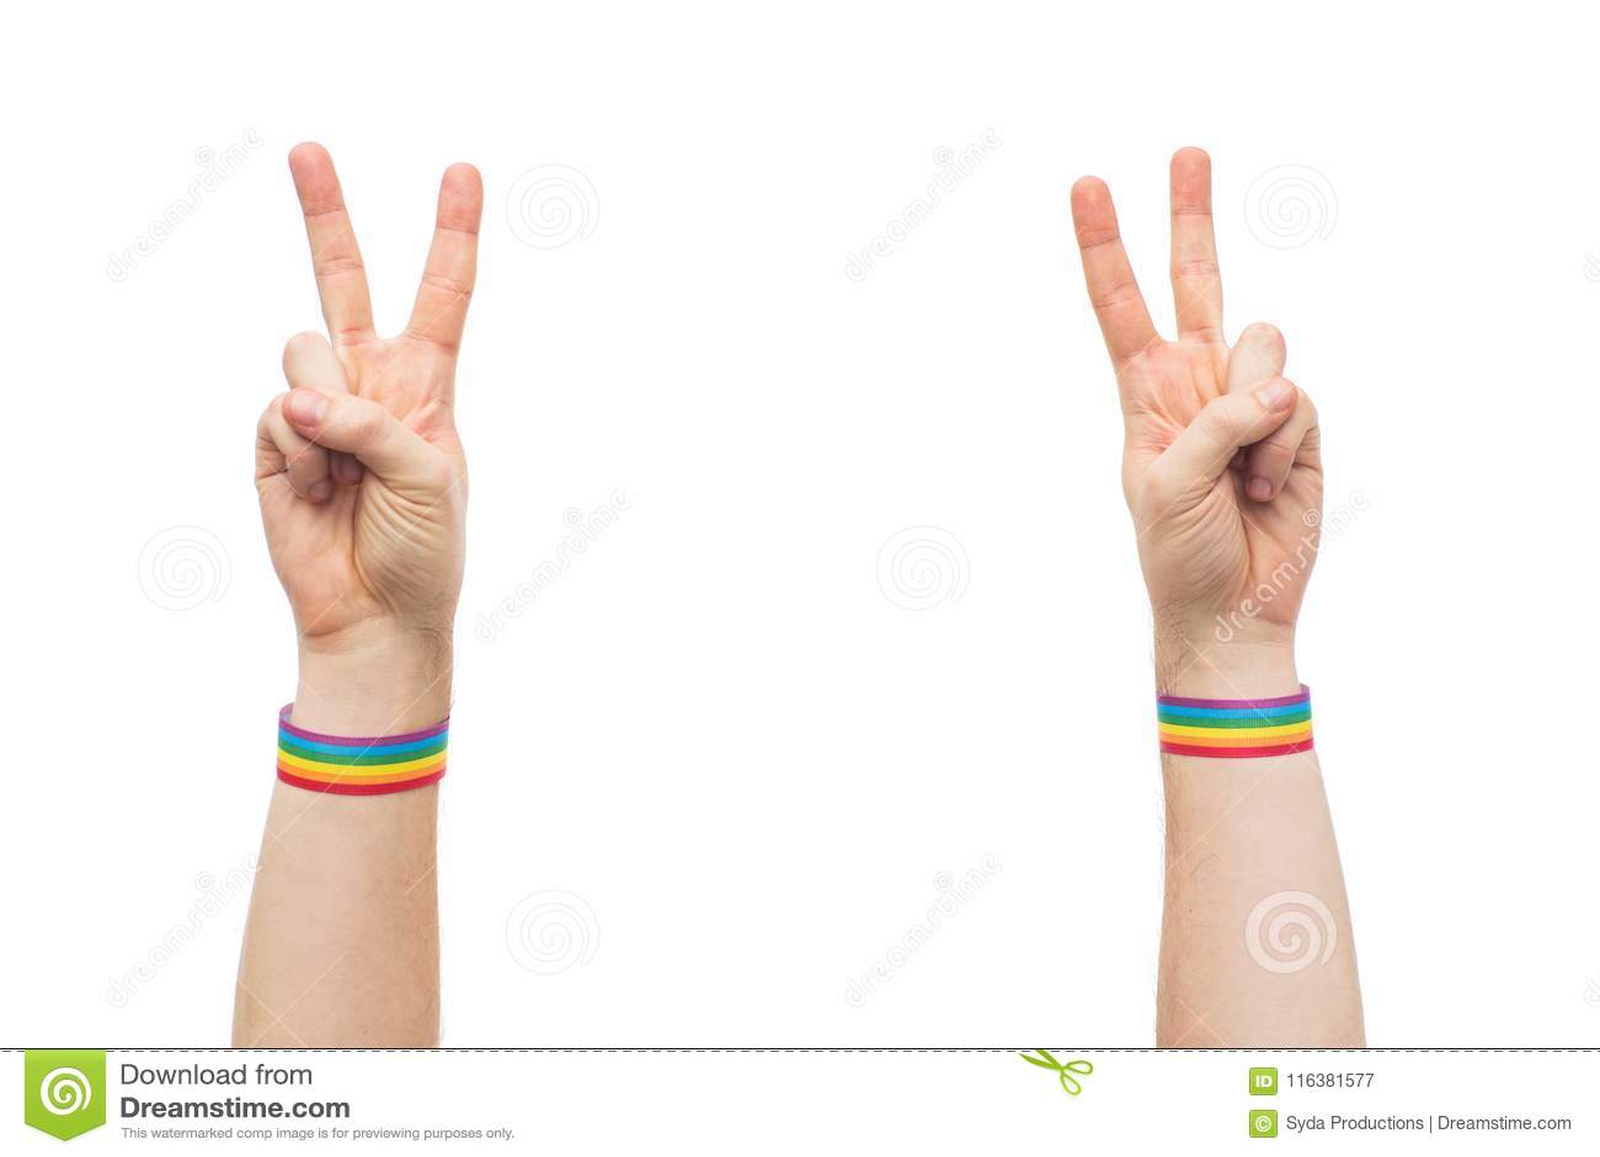 Dream symbol homosexual relationship